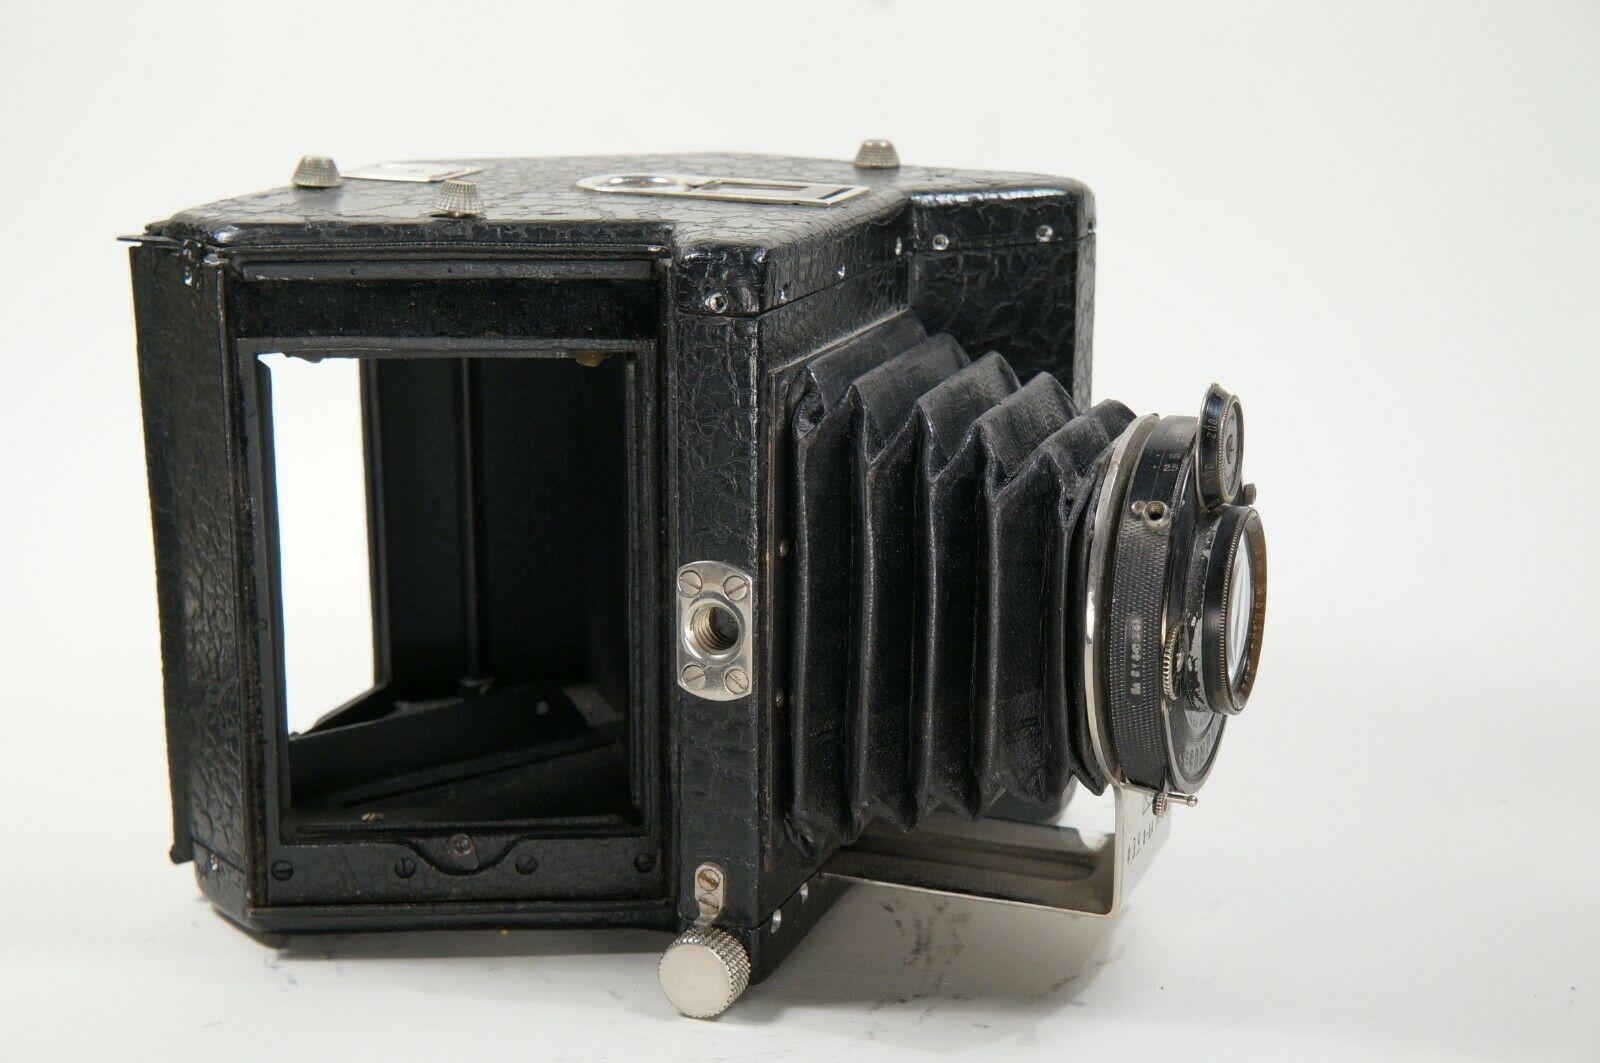 Soviet RGB colour camera (Pic: Olg_se3/eBay)